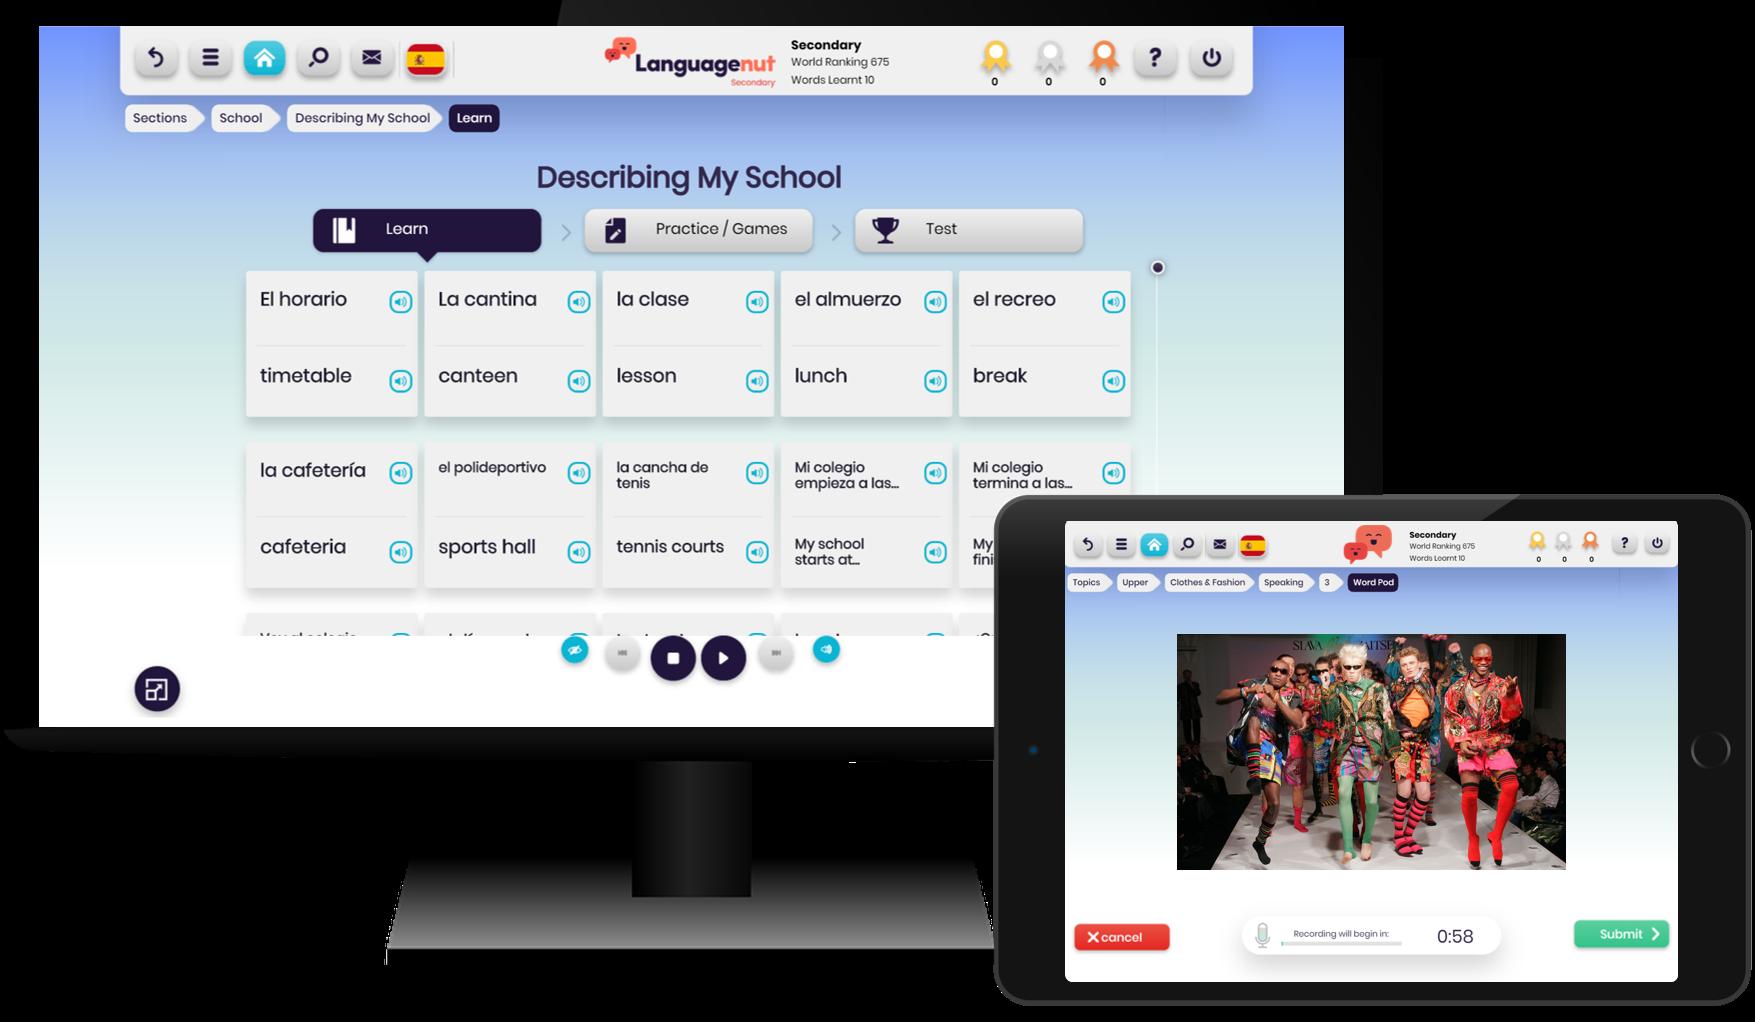 Languagenut Secondary   Secondary Language Platform